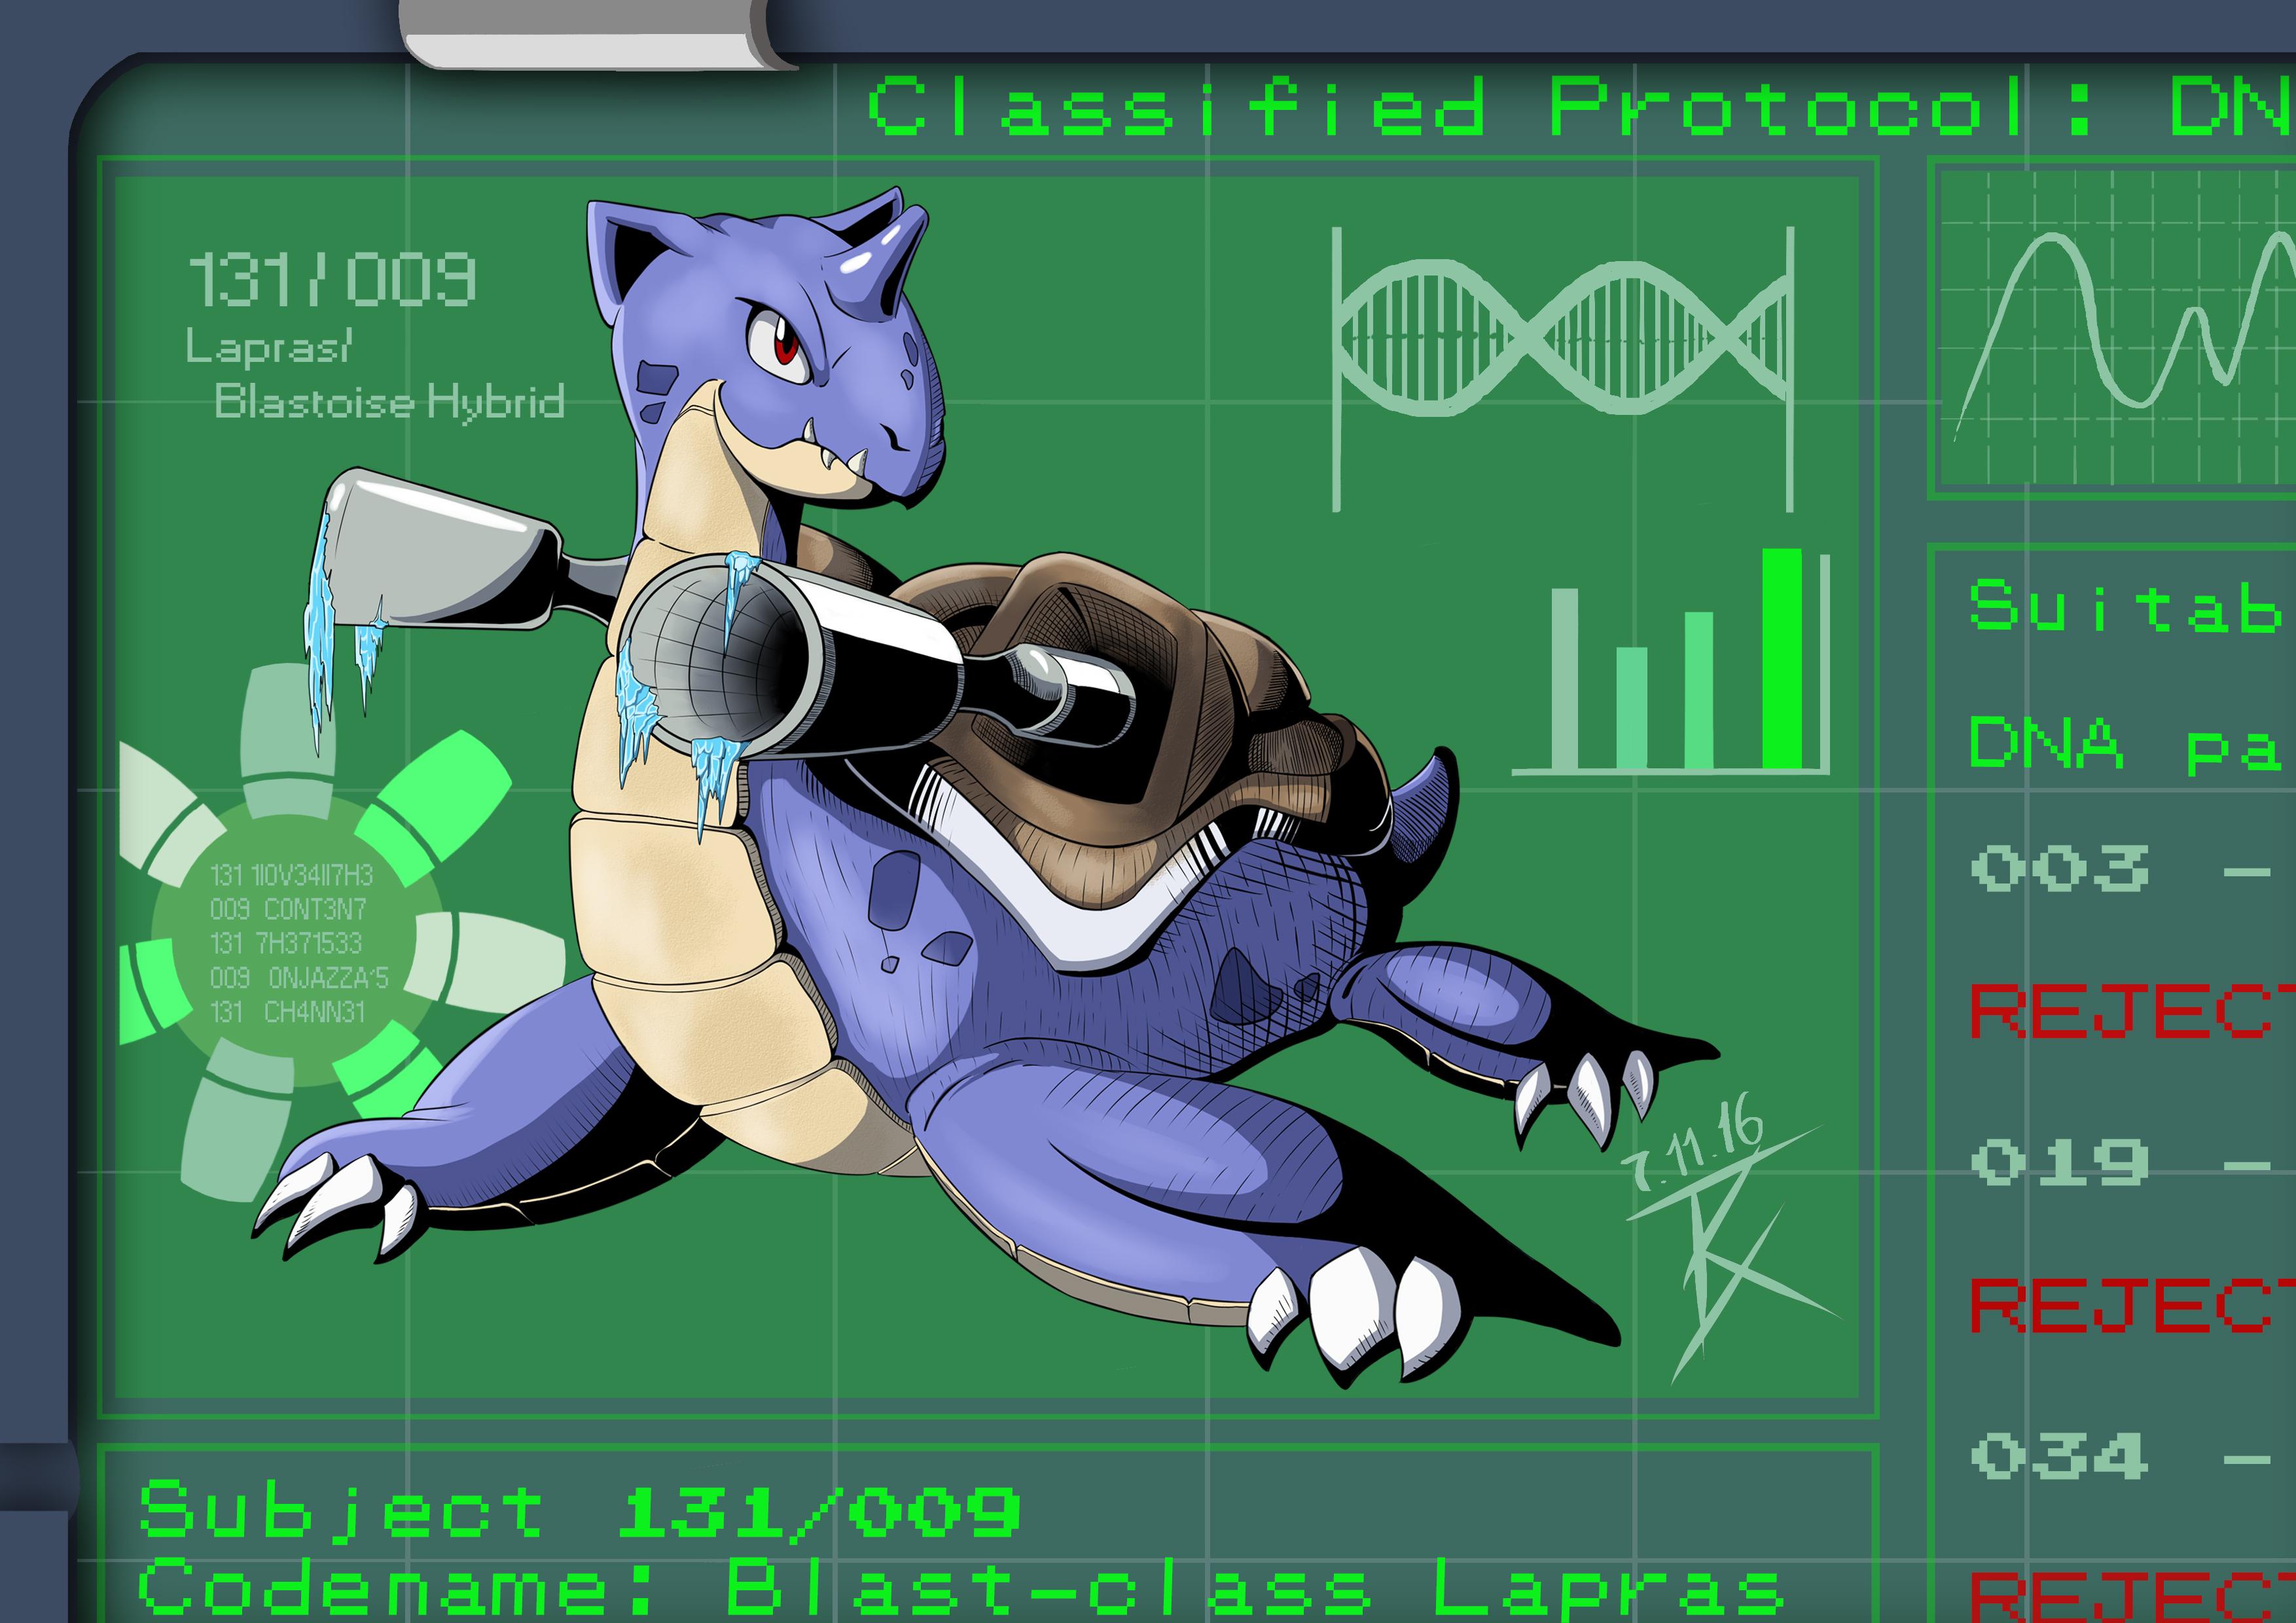 Blastoise-Lapras hybrid